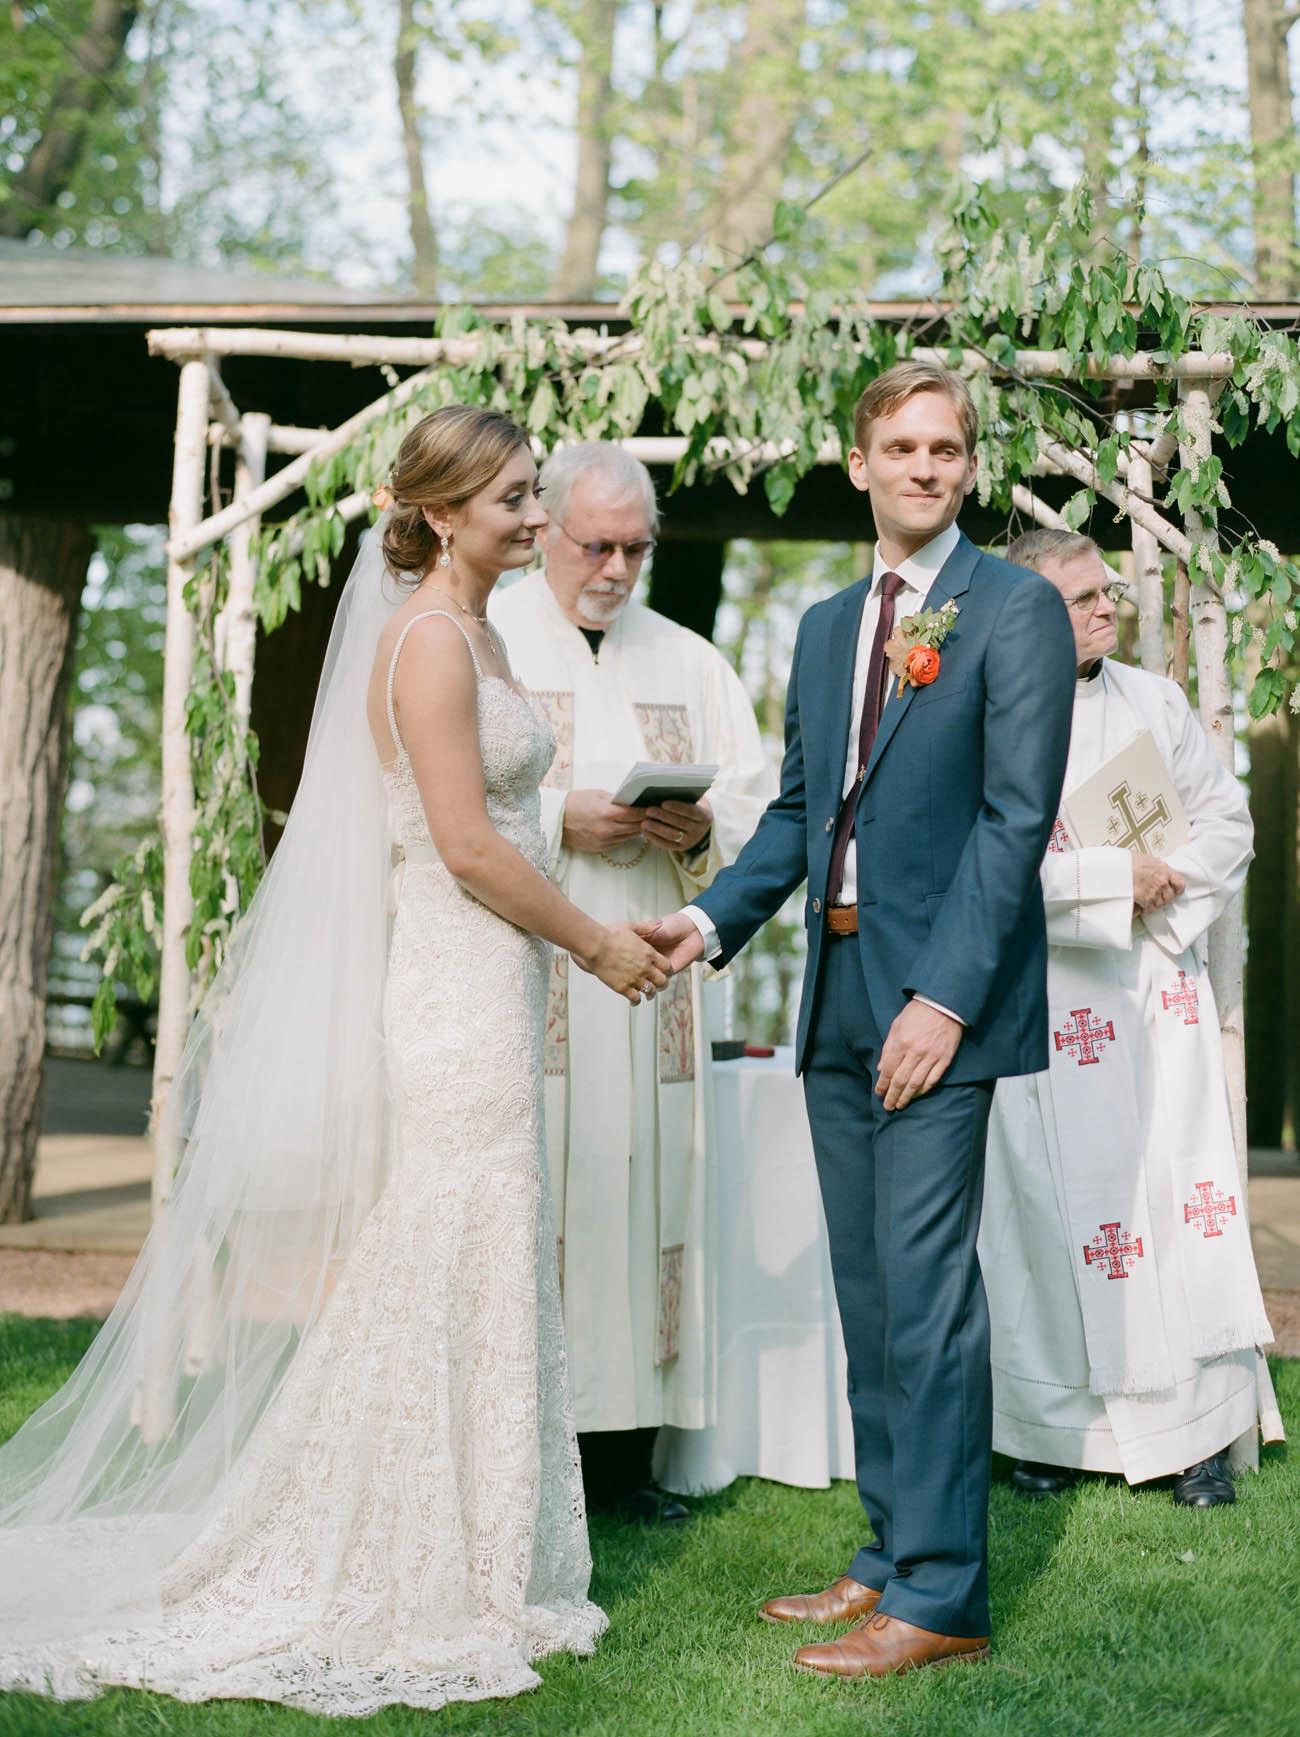 kateweinsteinphoto_schlitz_audubon_milwaukee_wedding-205.jpg